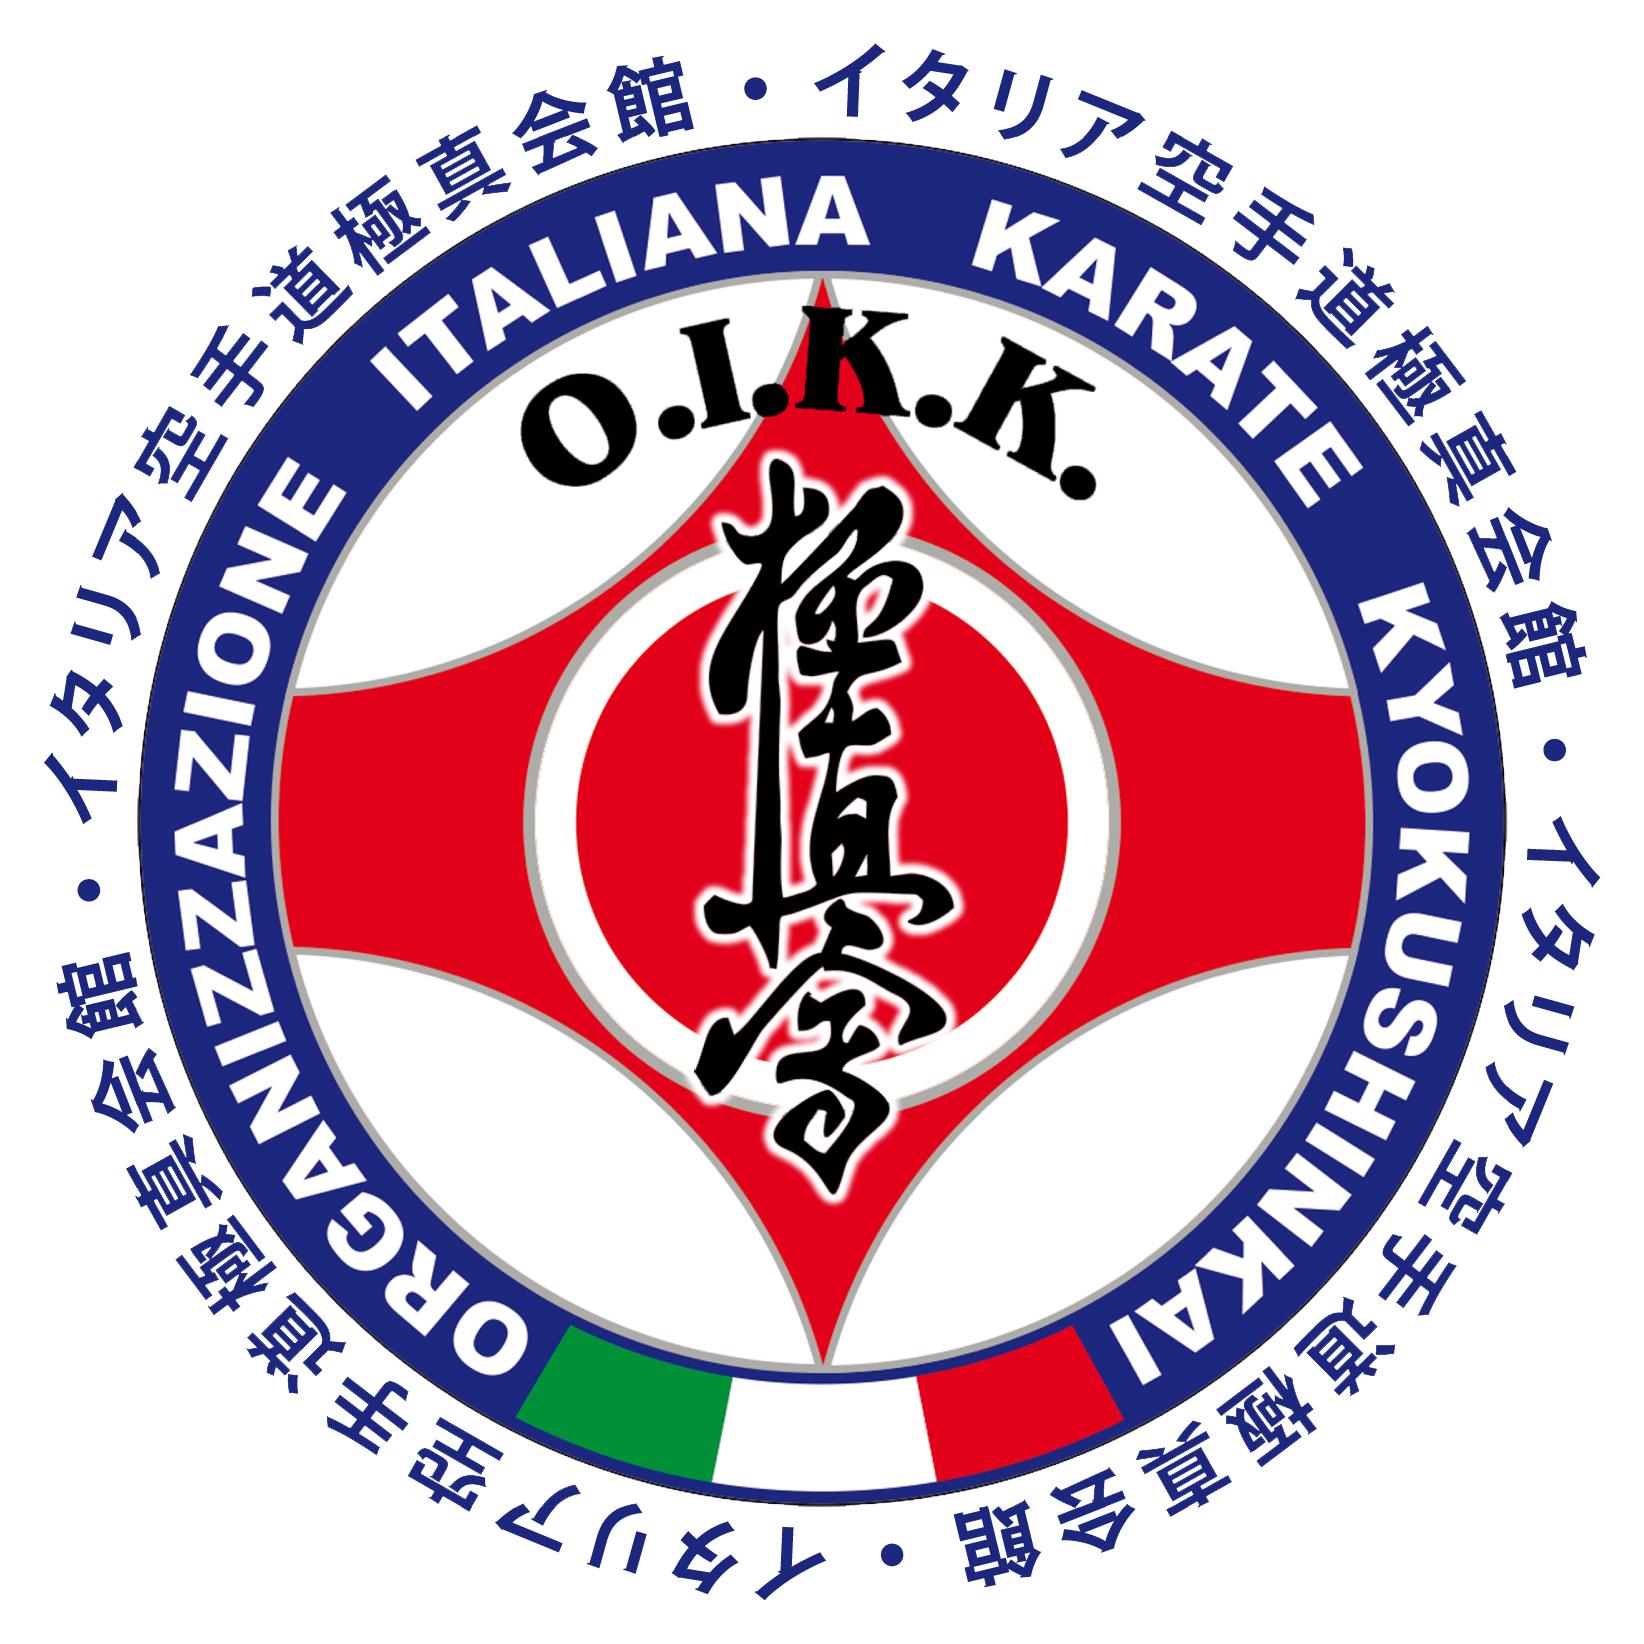 logo con testo giapponese-2.png